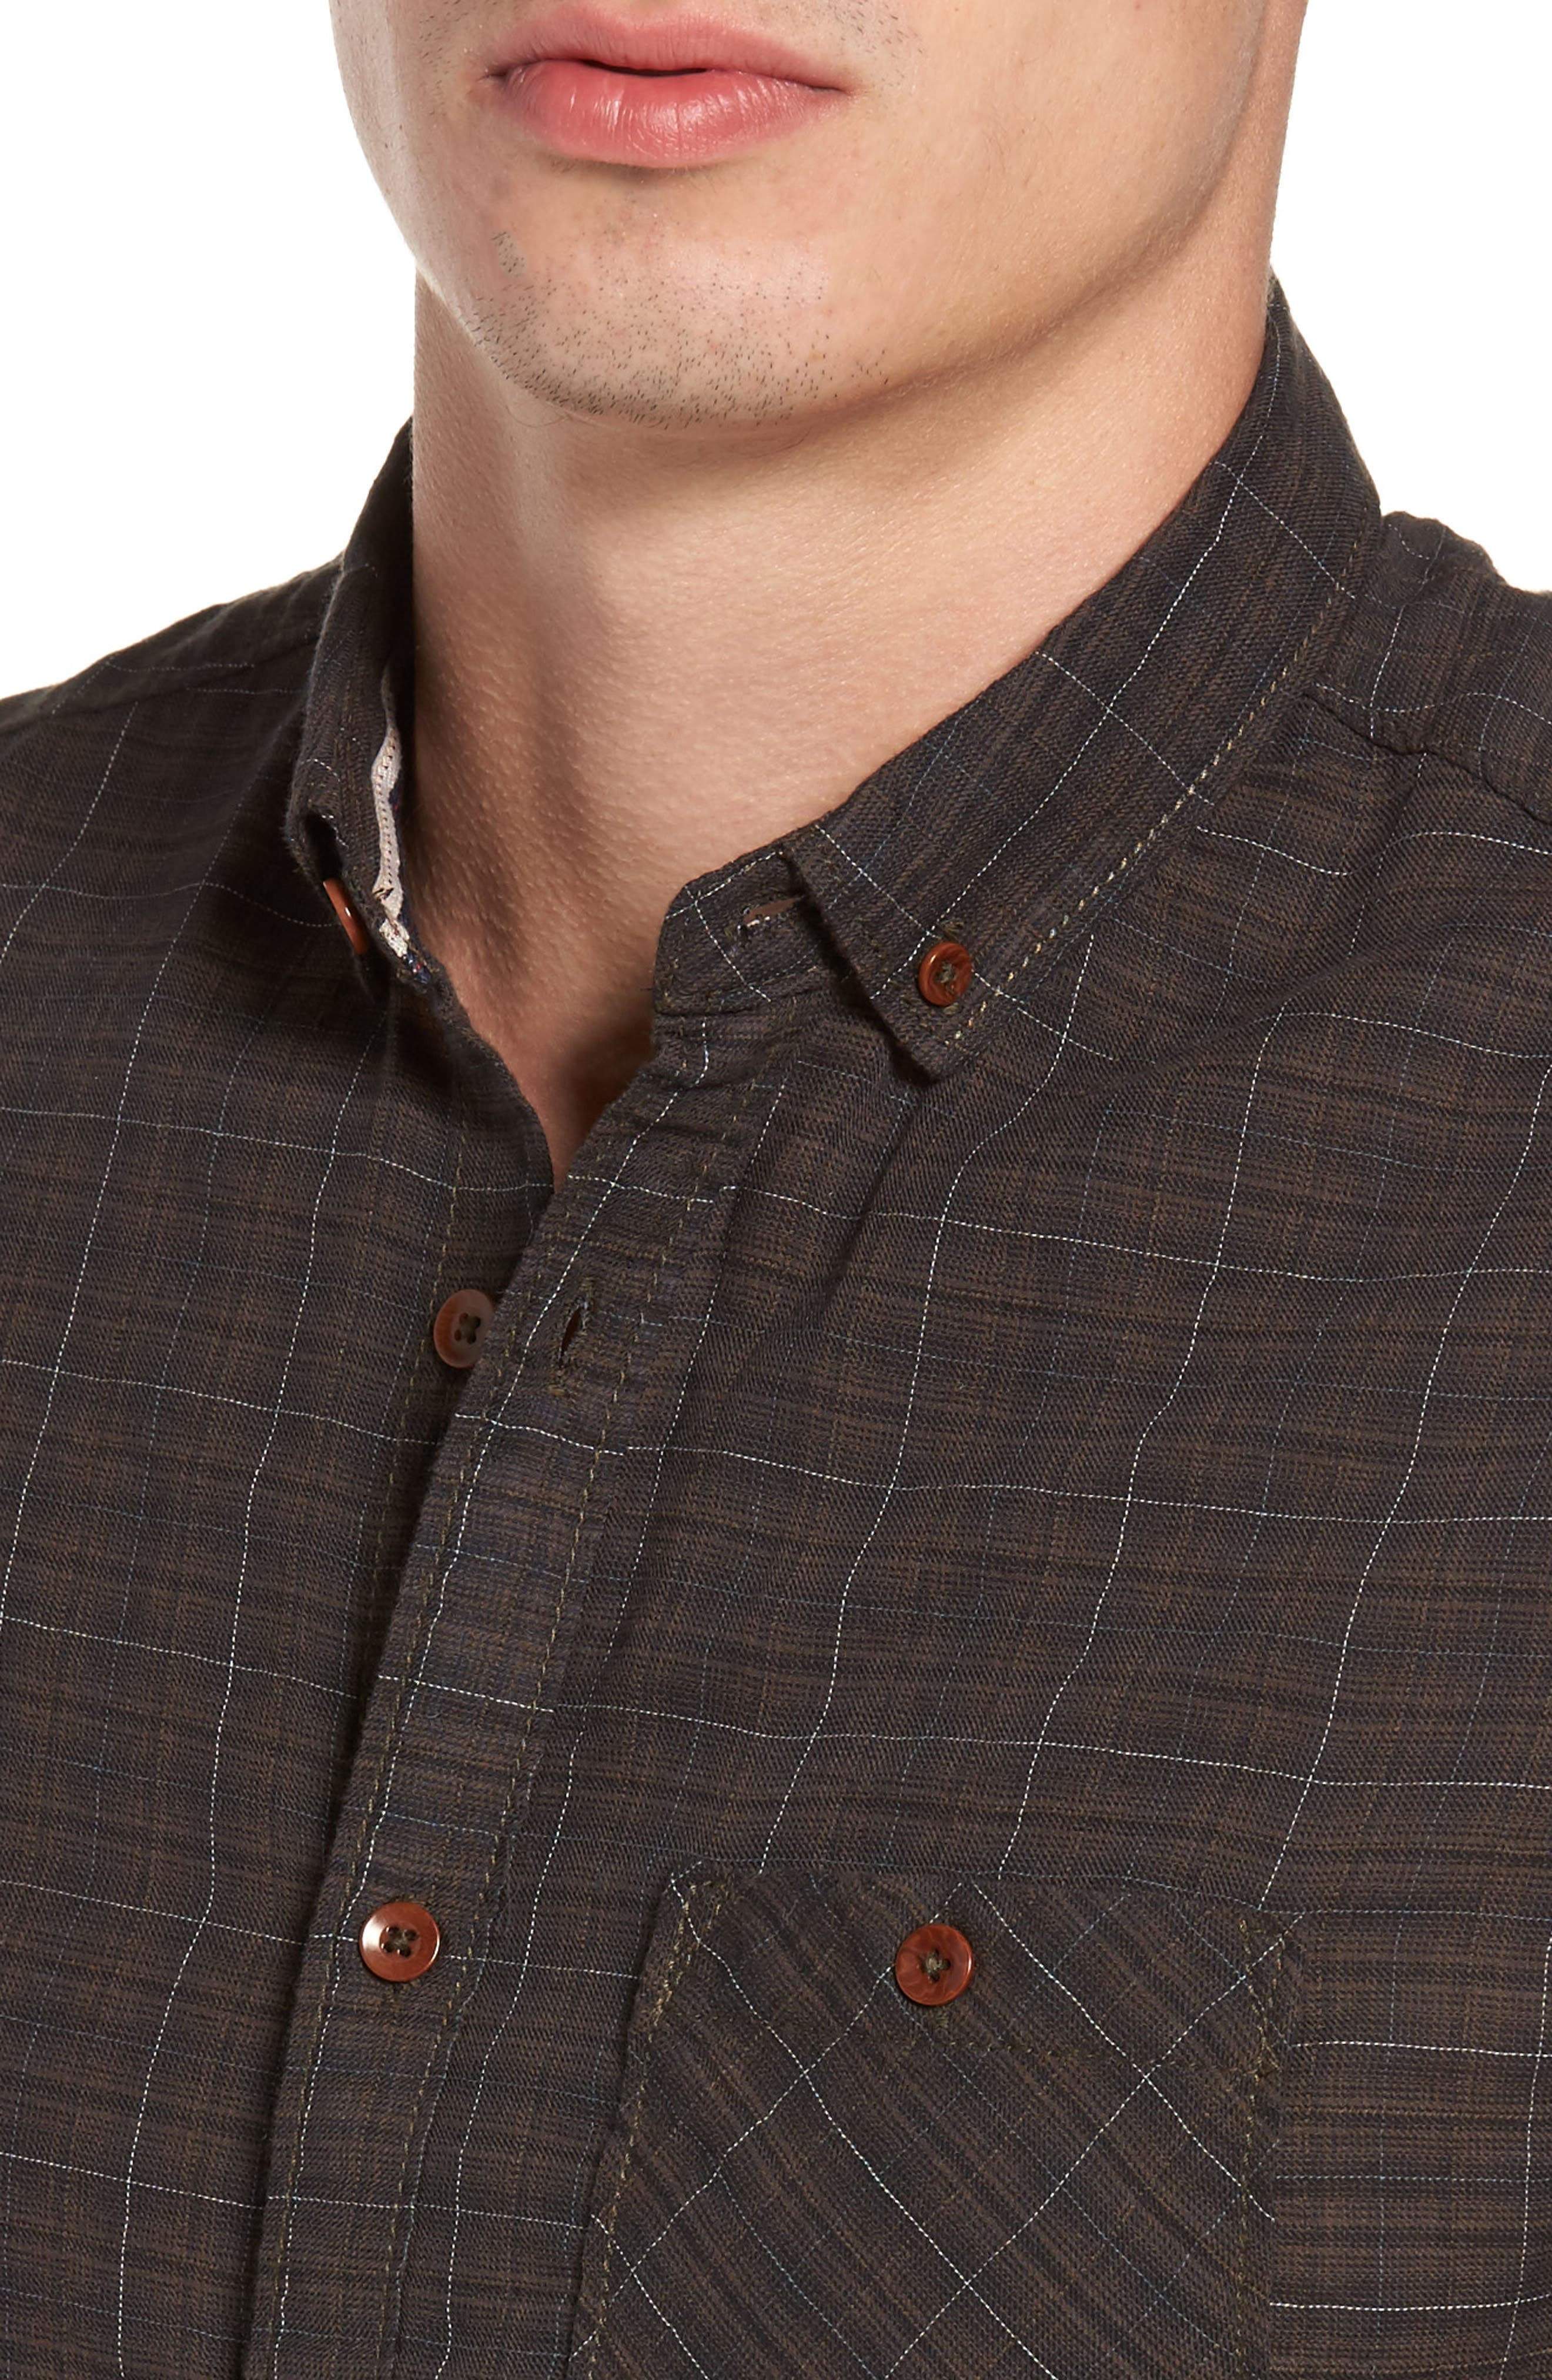 Molera Pucker Plaid Sport Shirt,                             Alternate thumbnail 4, color,                             202